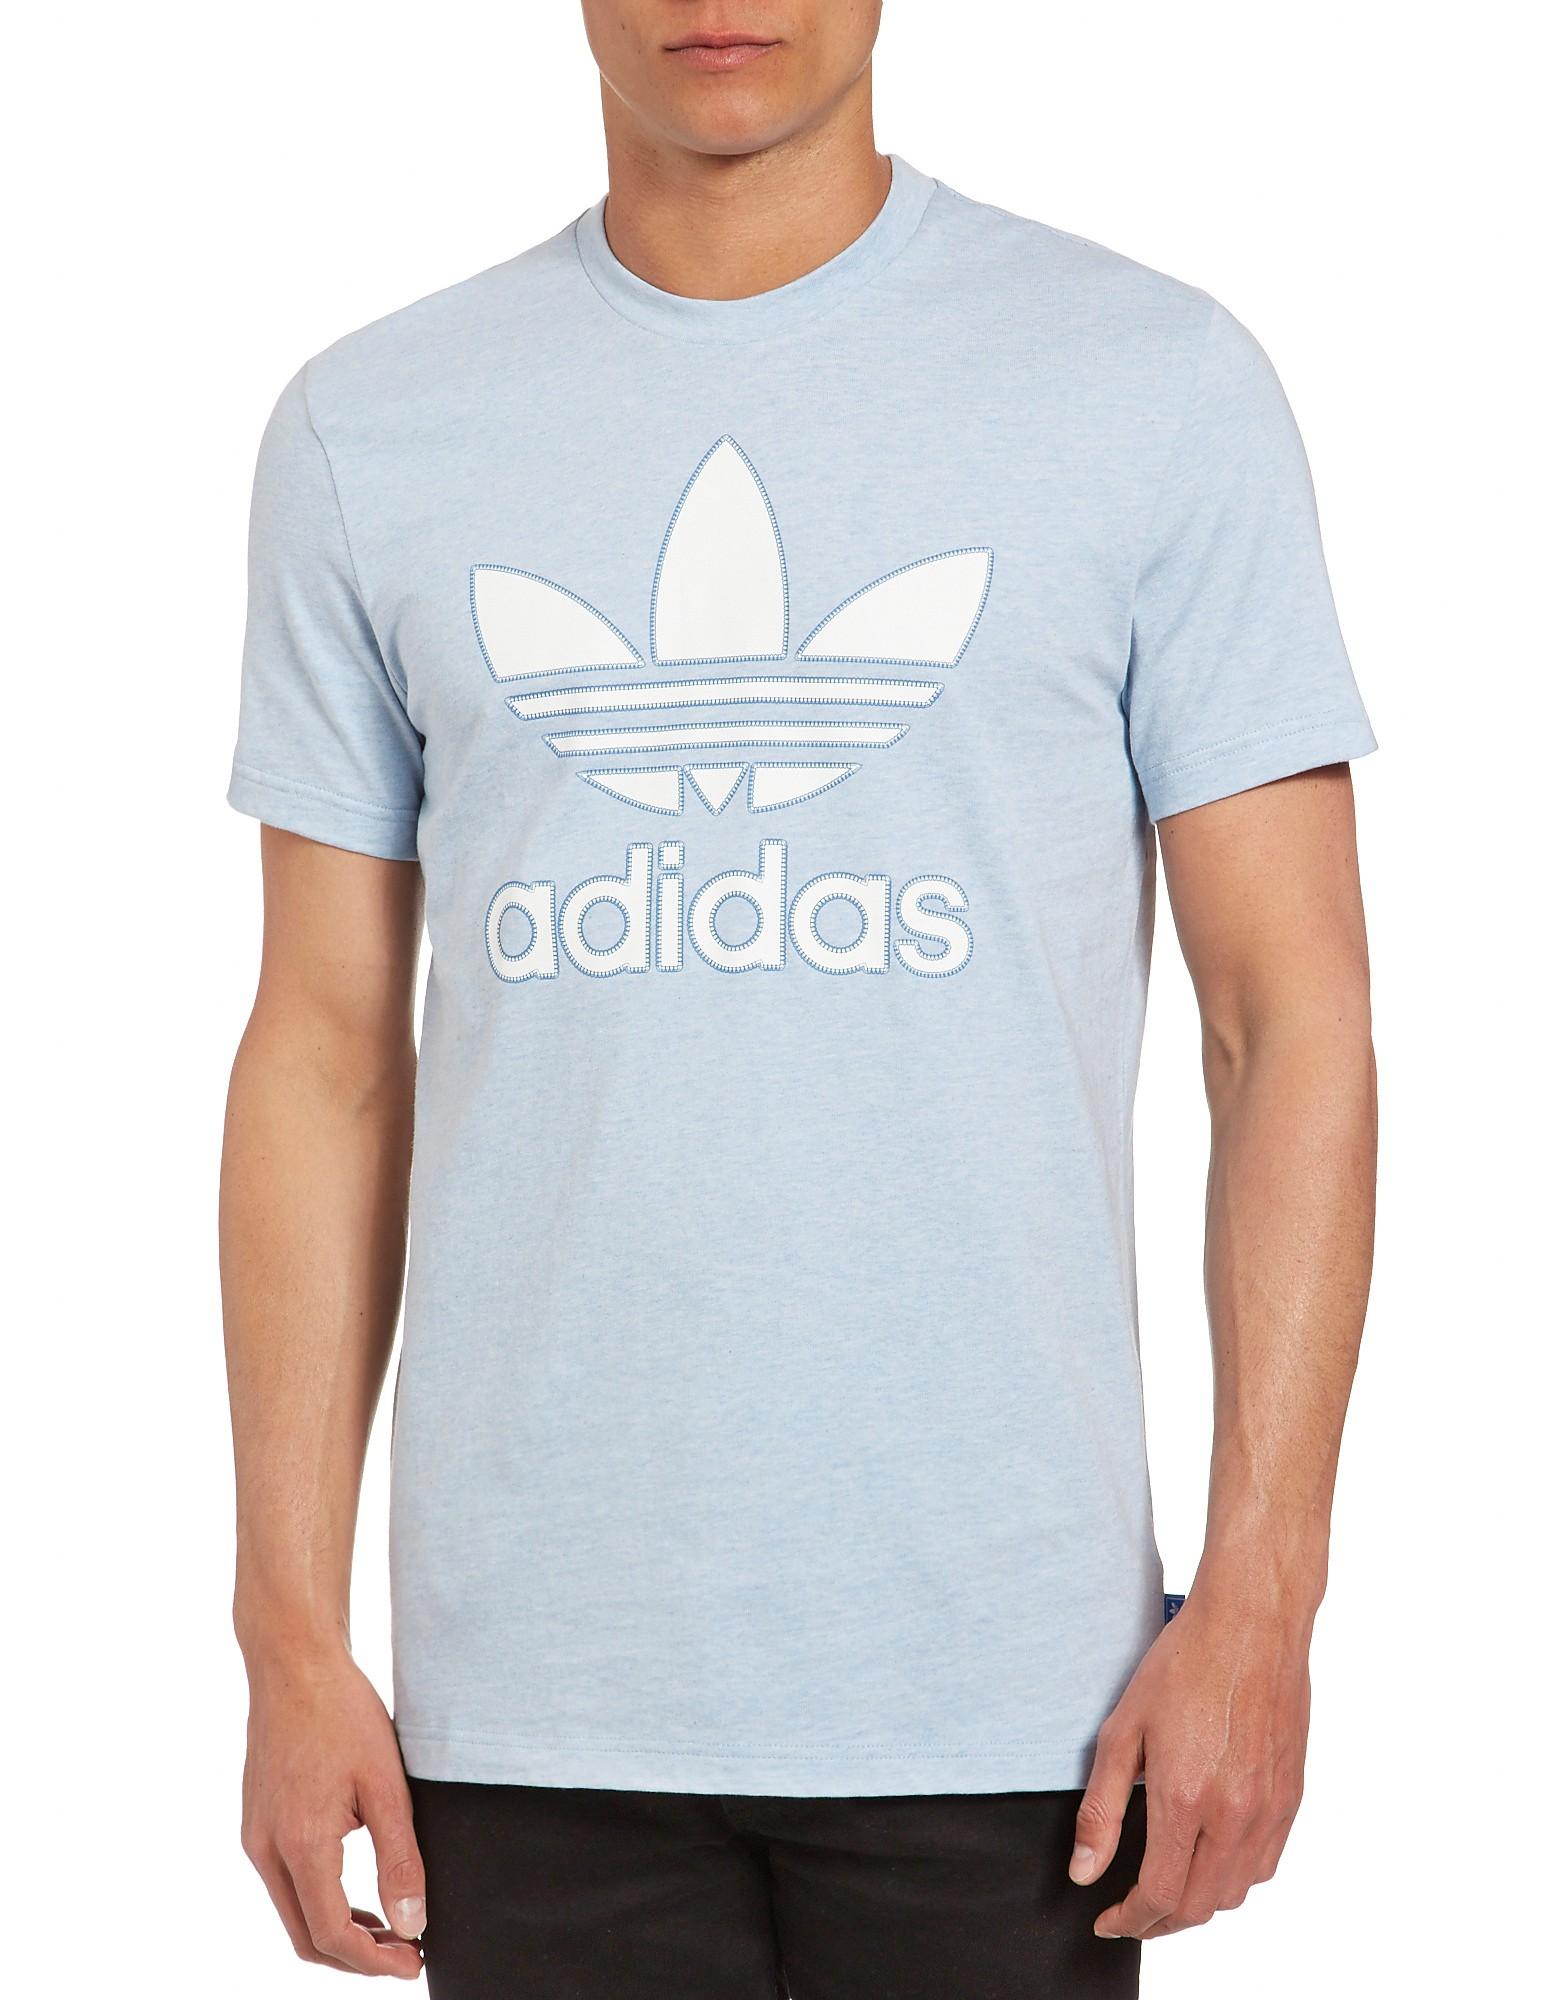 adidas Originals Trefoil Melange T-Shirt product image